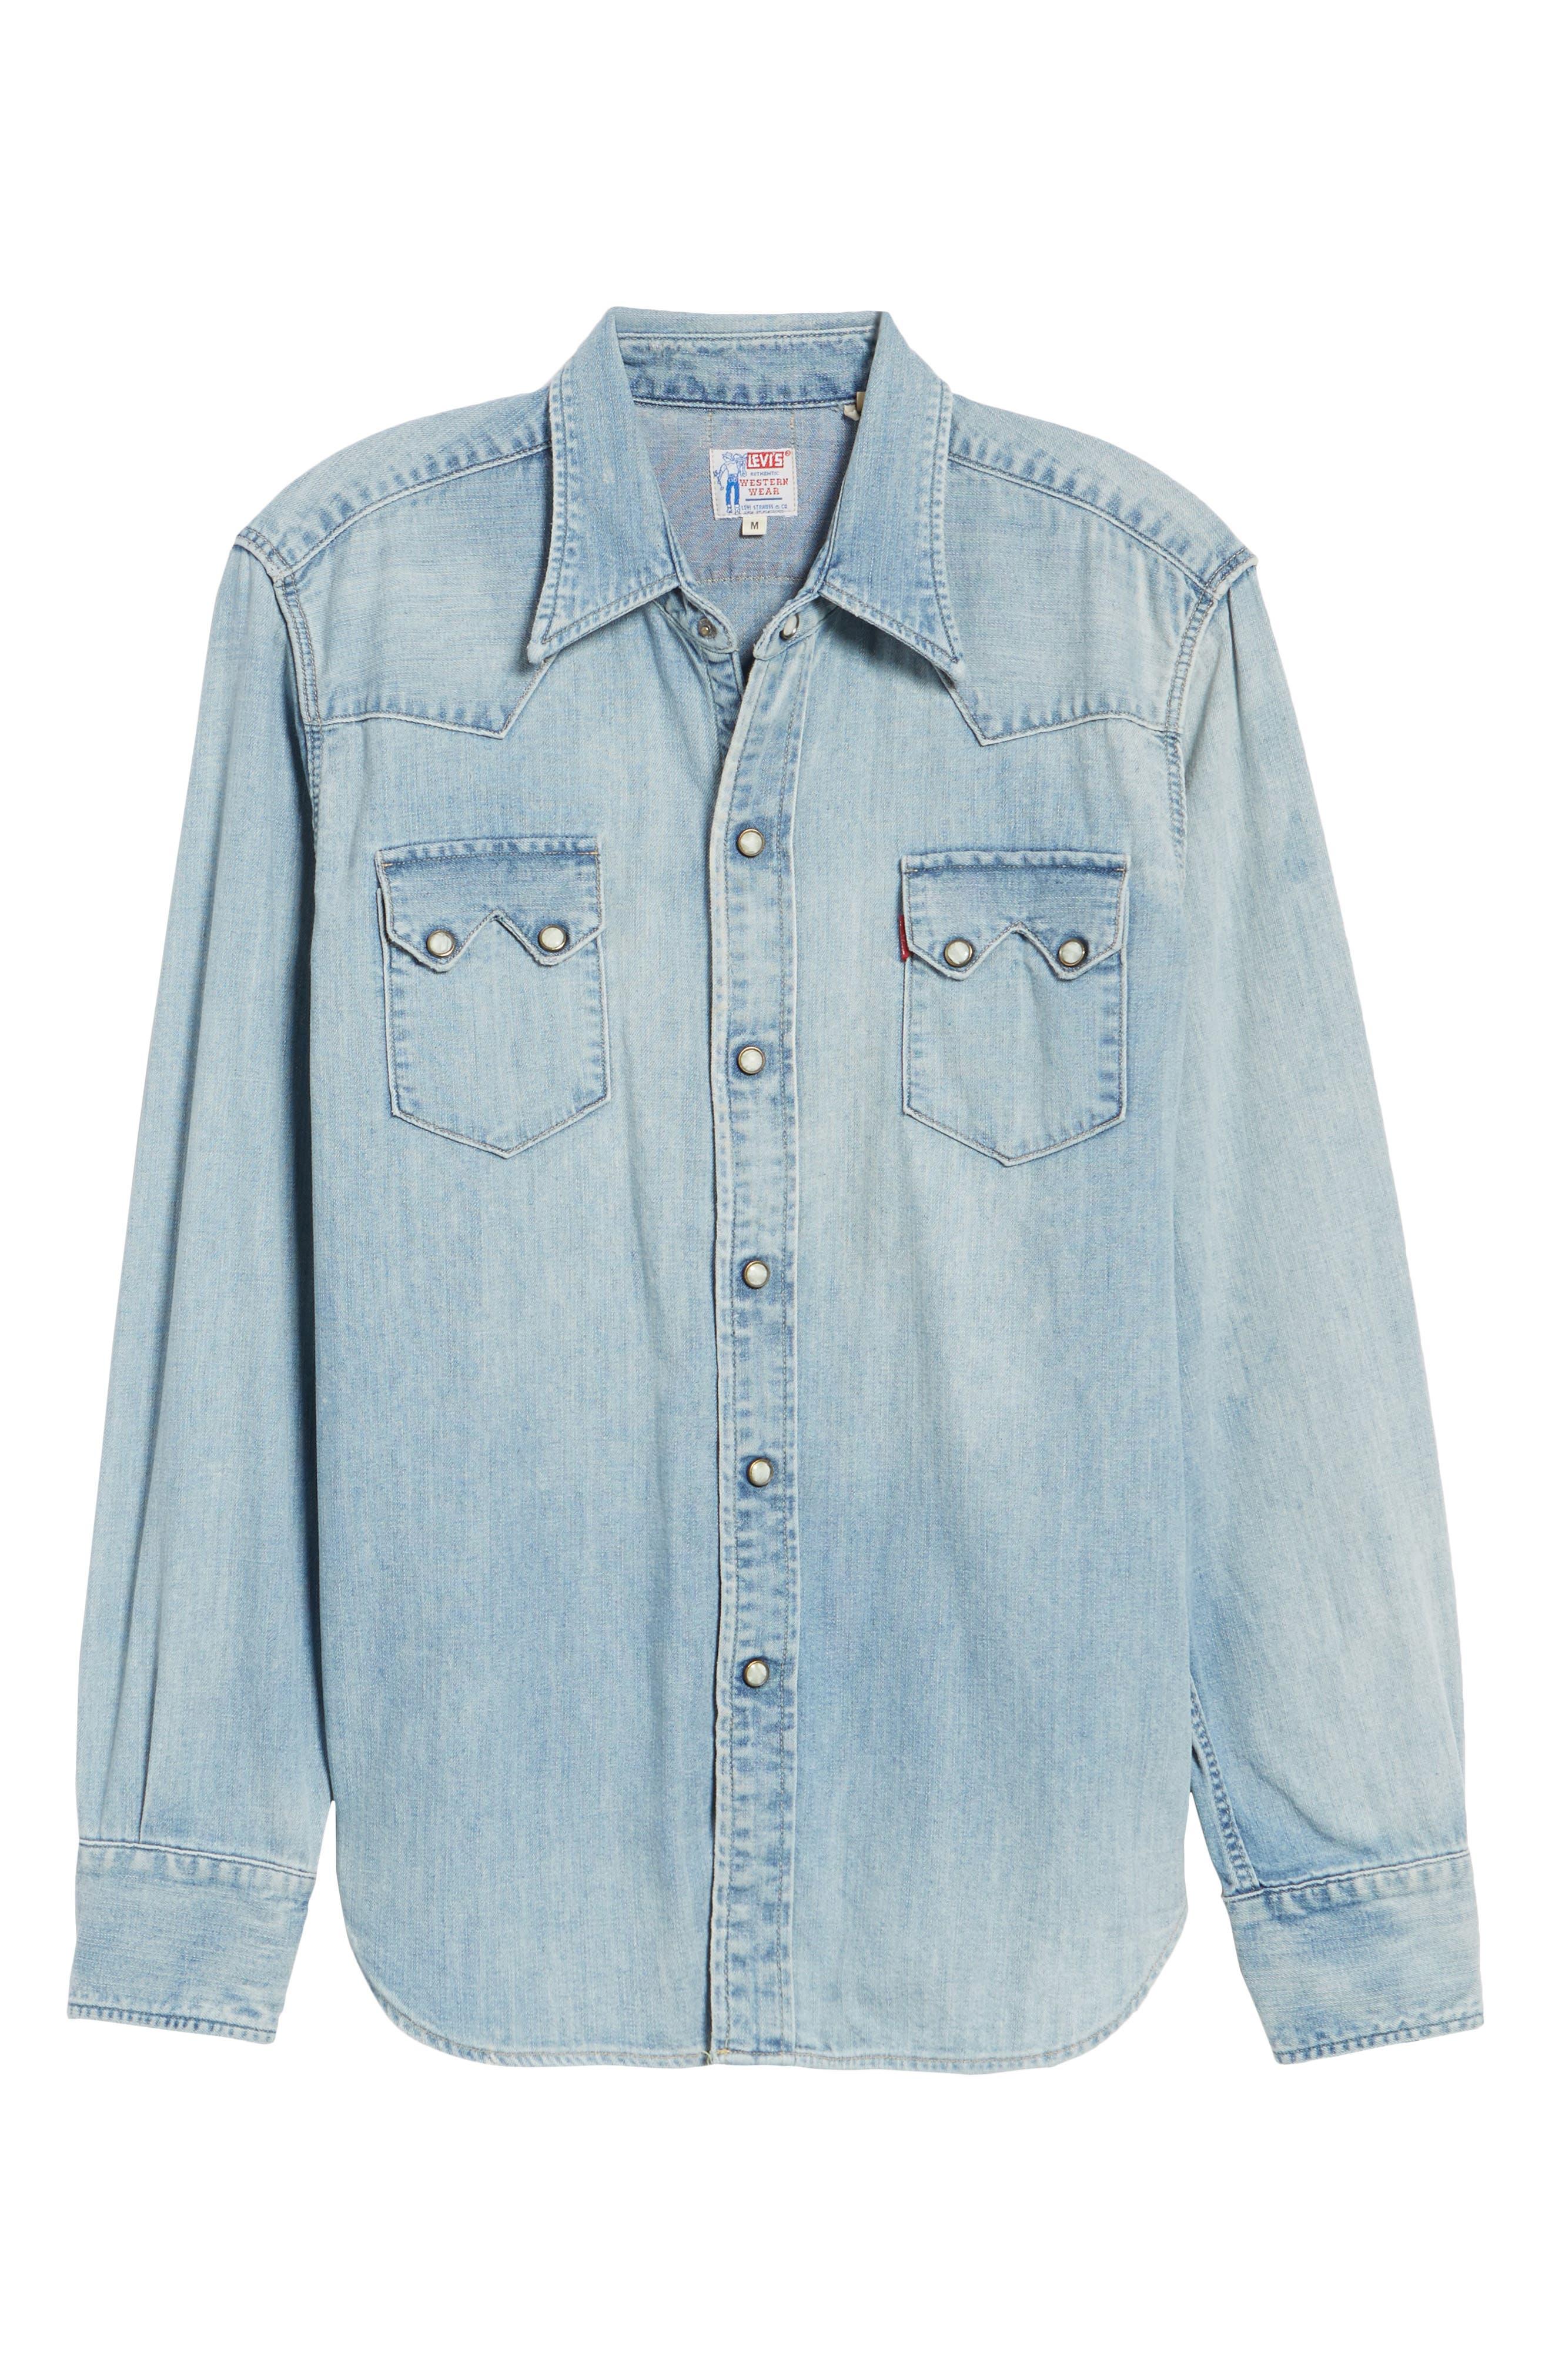 1955 Sawtooth Trim Fit Denim Western Shirt,                             Alternate thumbnail 5, color,